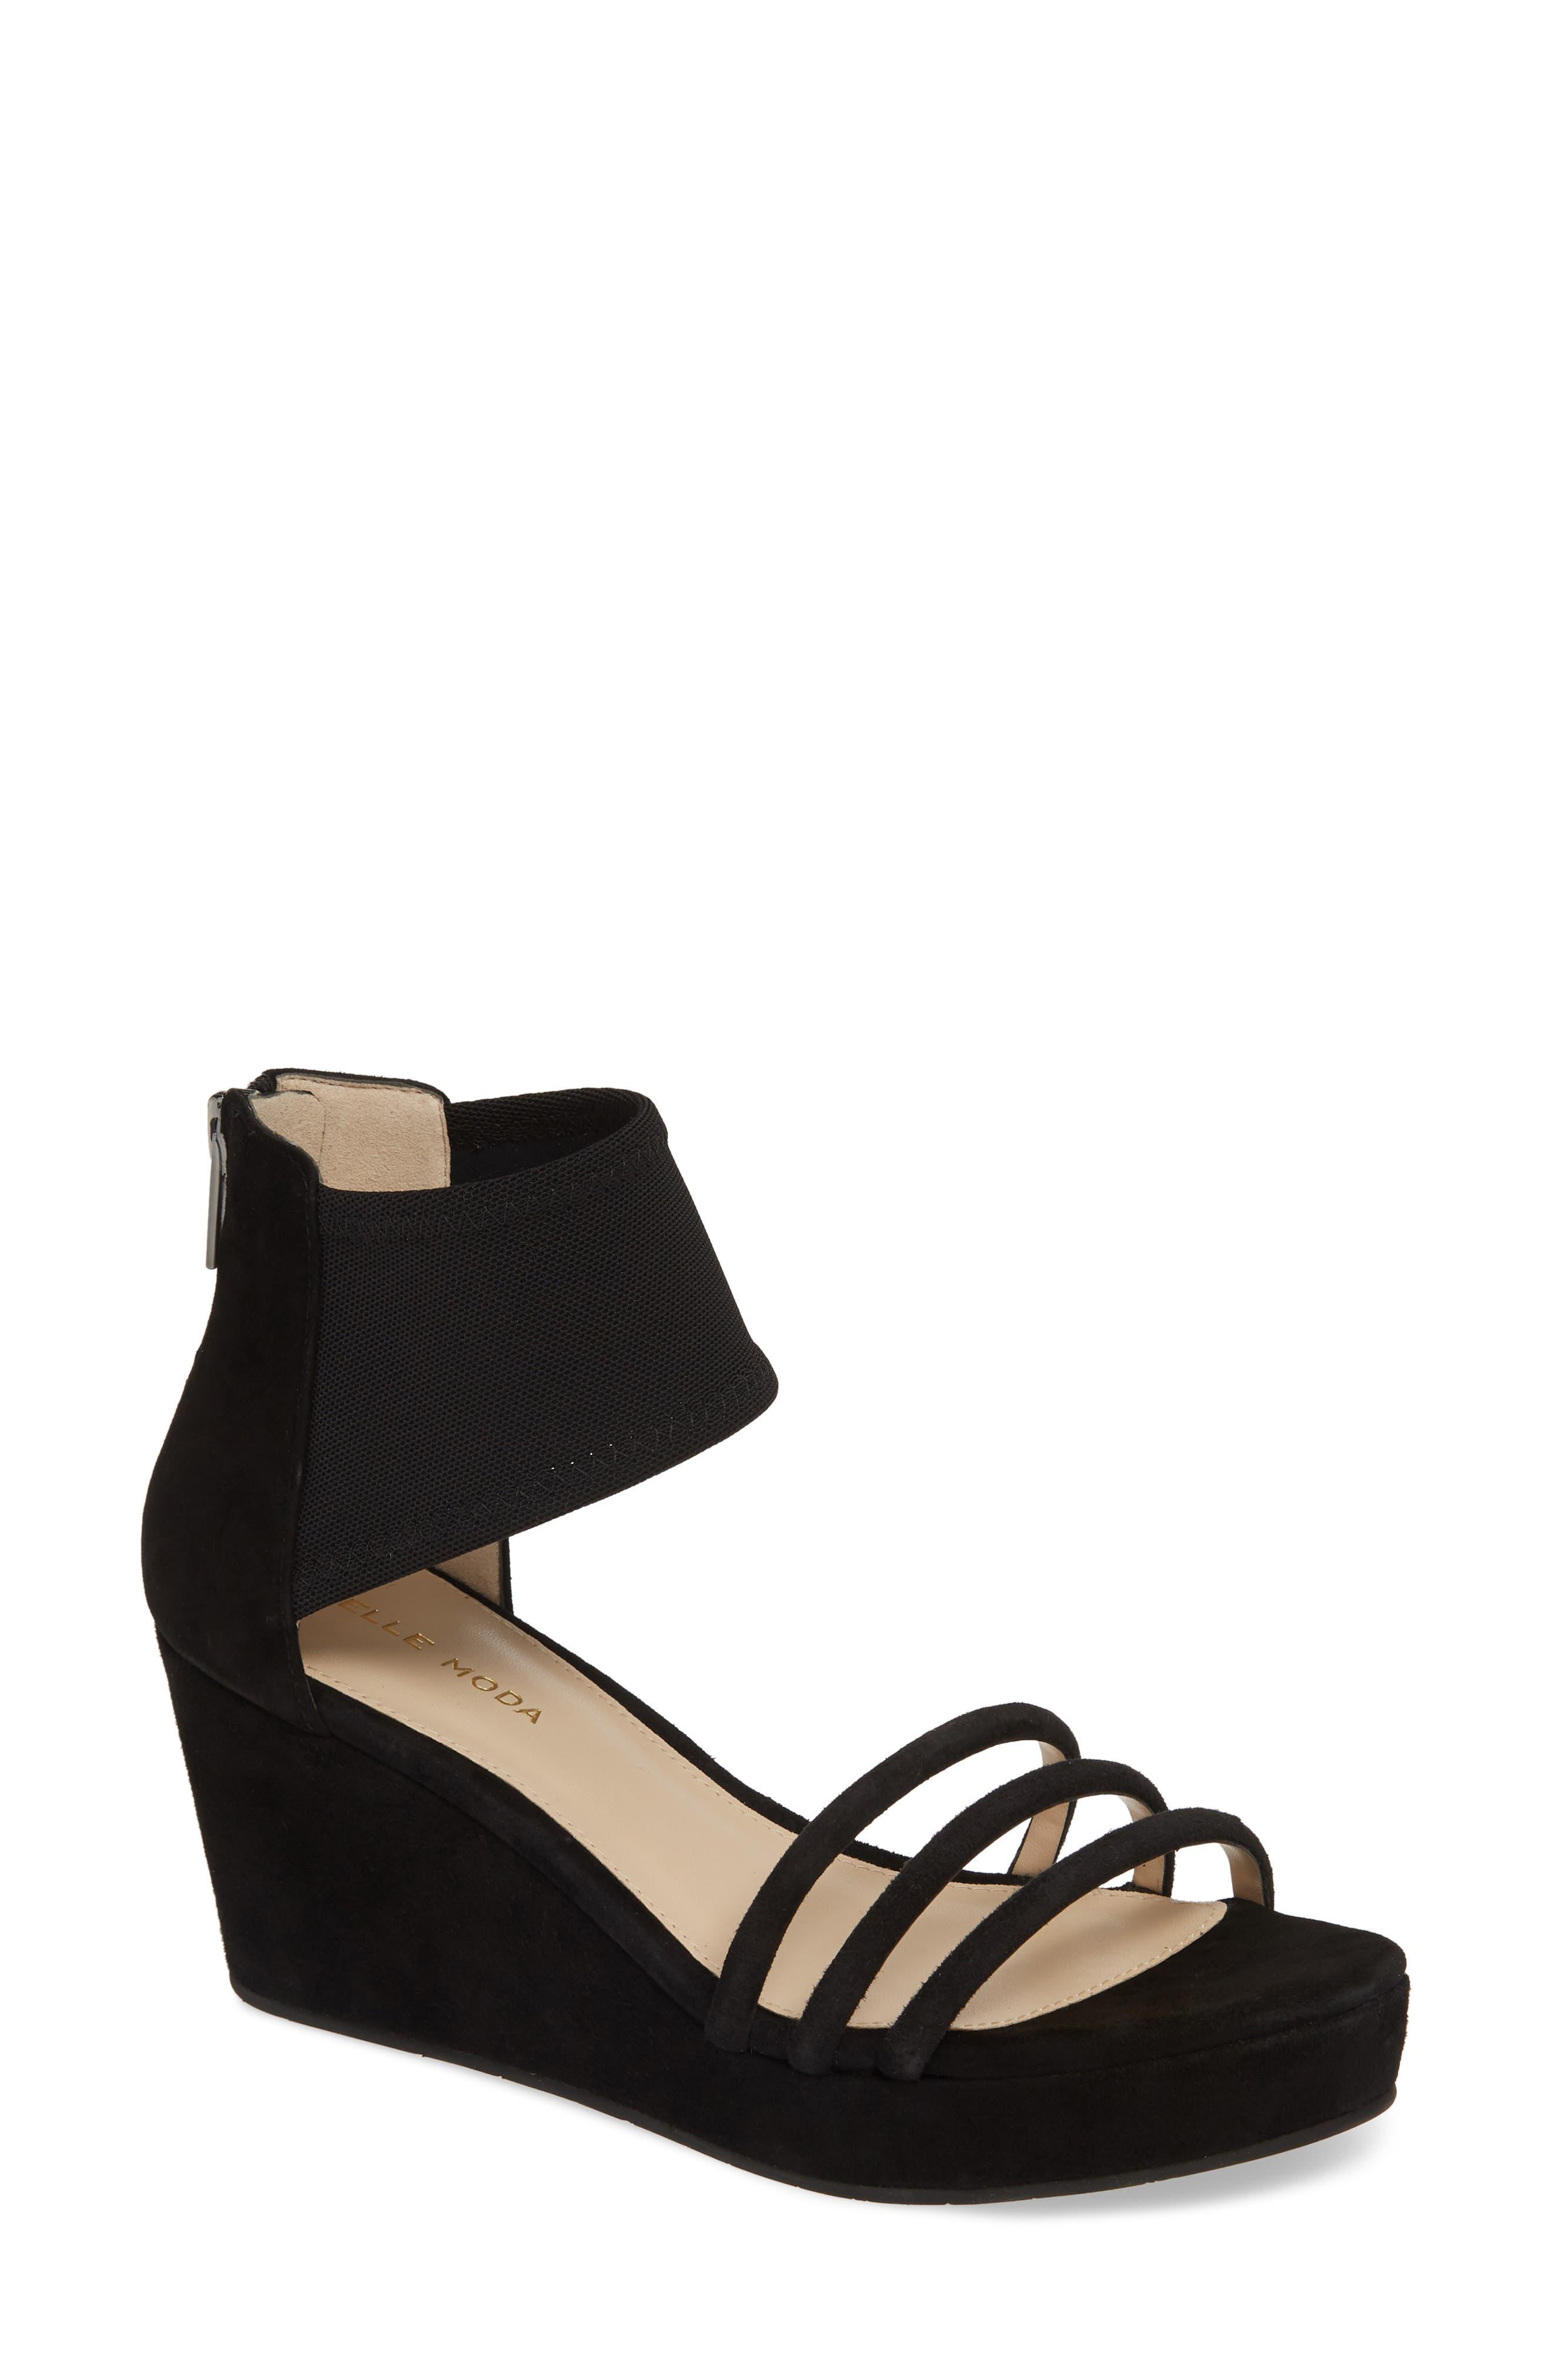 PELLE MODA Katrice Platform Wedge Sandal, Main, color, BLACK SUEDE